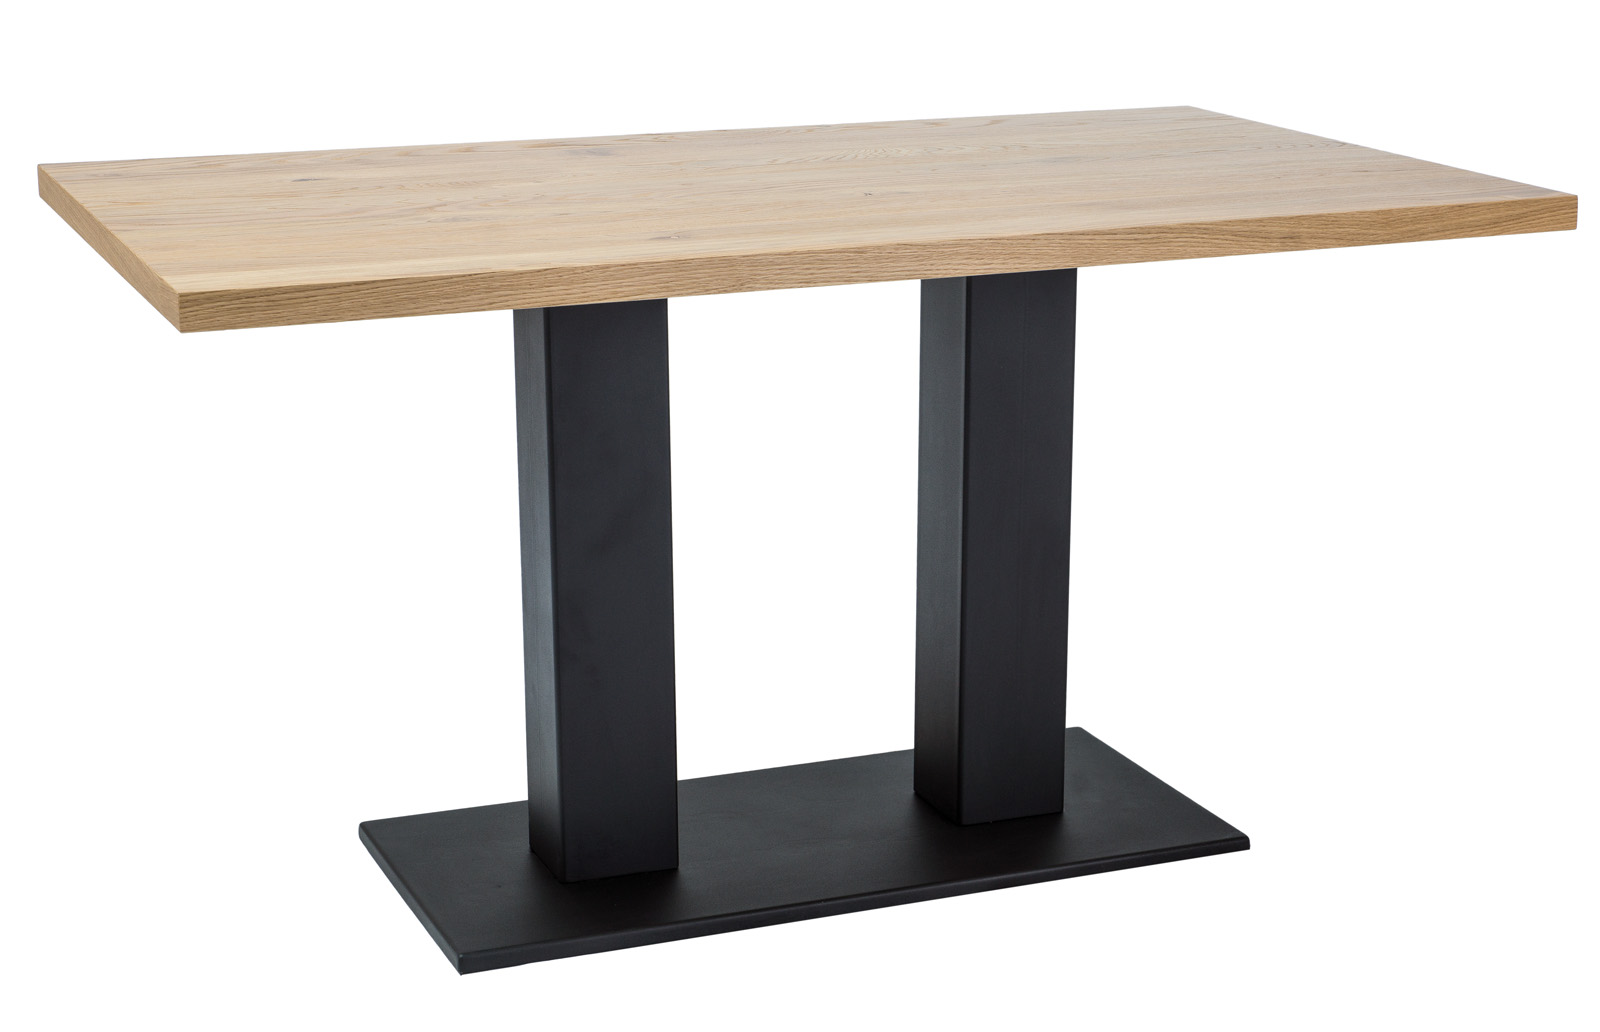 Masa din metal si lemn de furnir Sauron, L120xl80xh78 cm vivre.ro